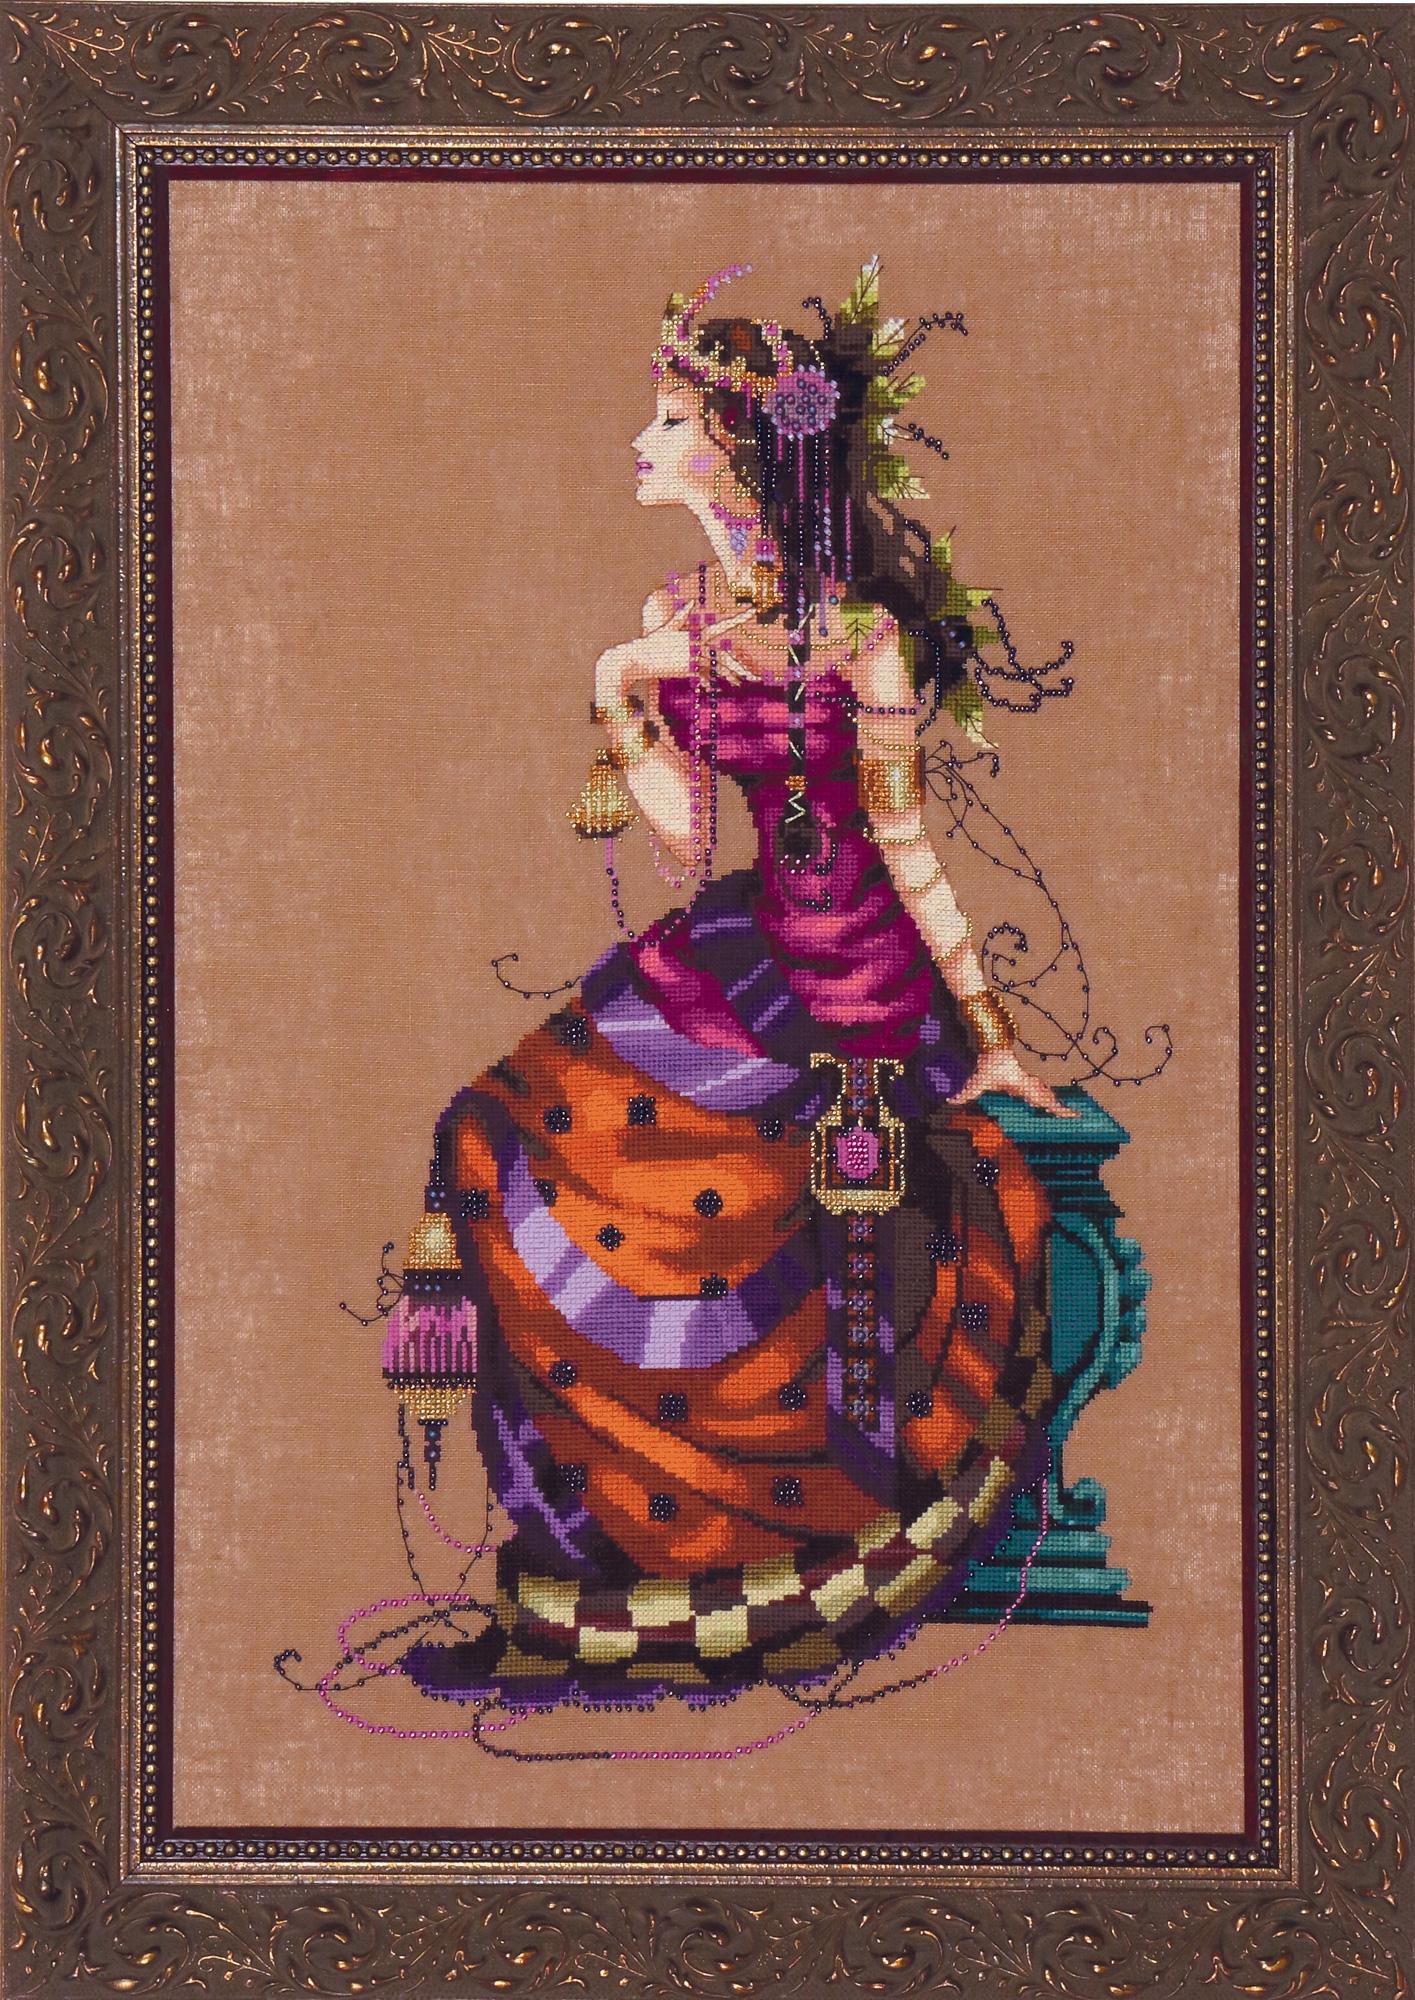 Gypsy Queen Cross Stitch Pattern by Mirabilia MD142